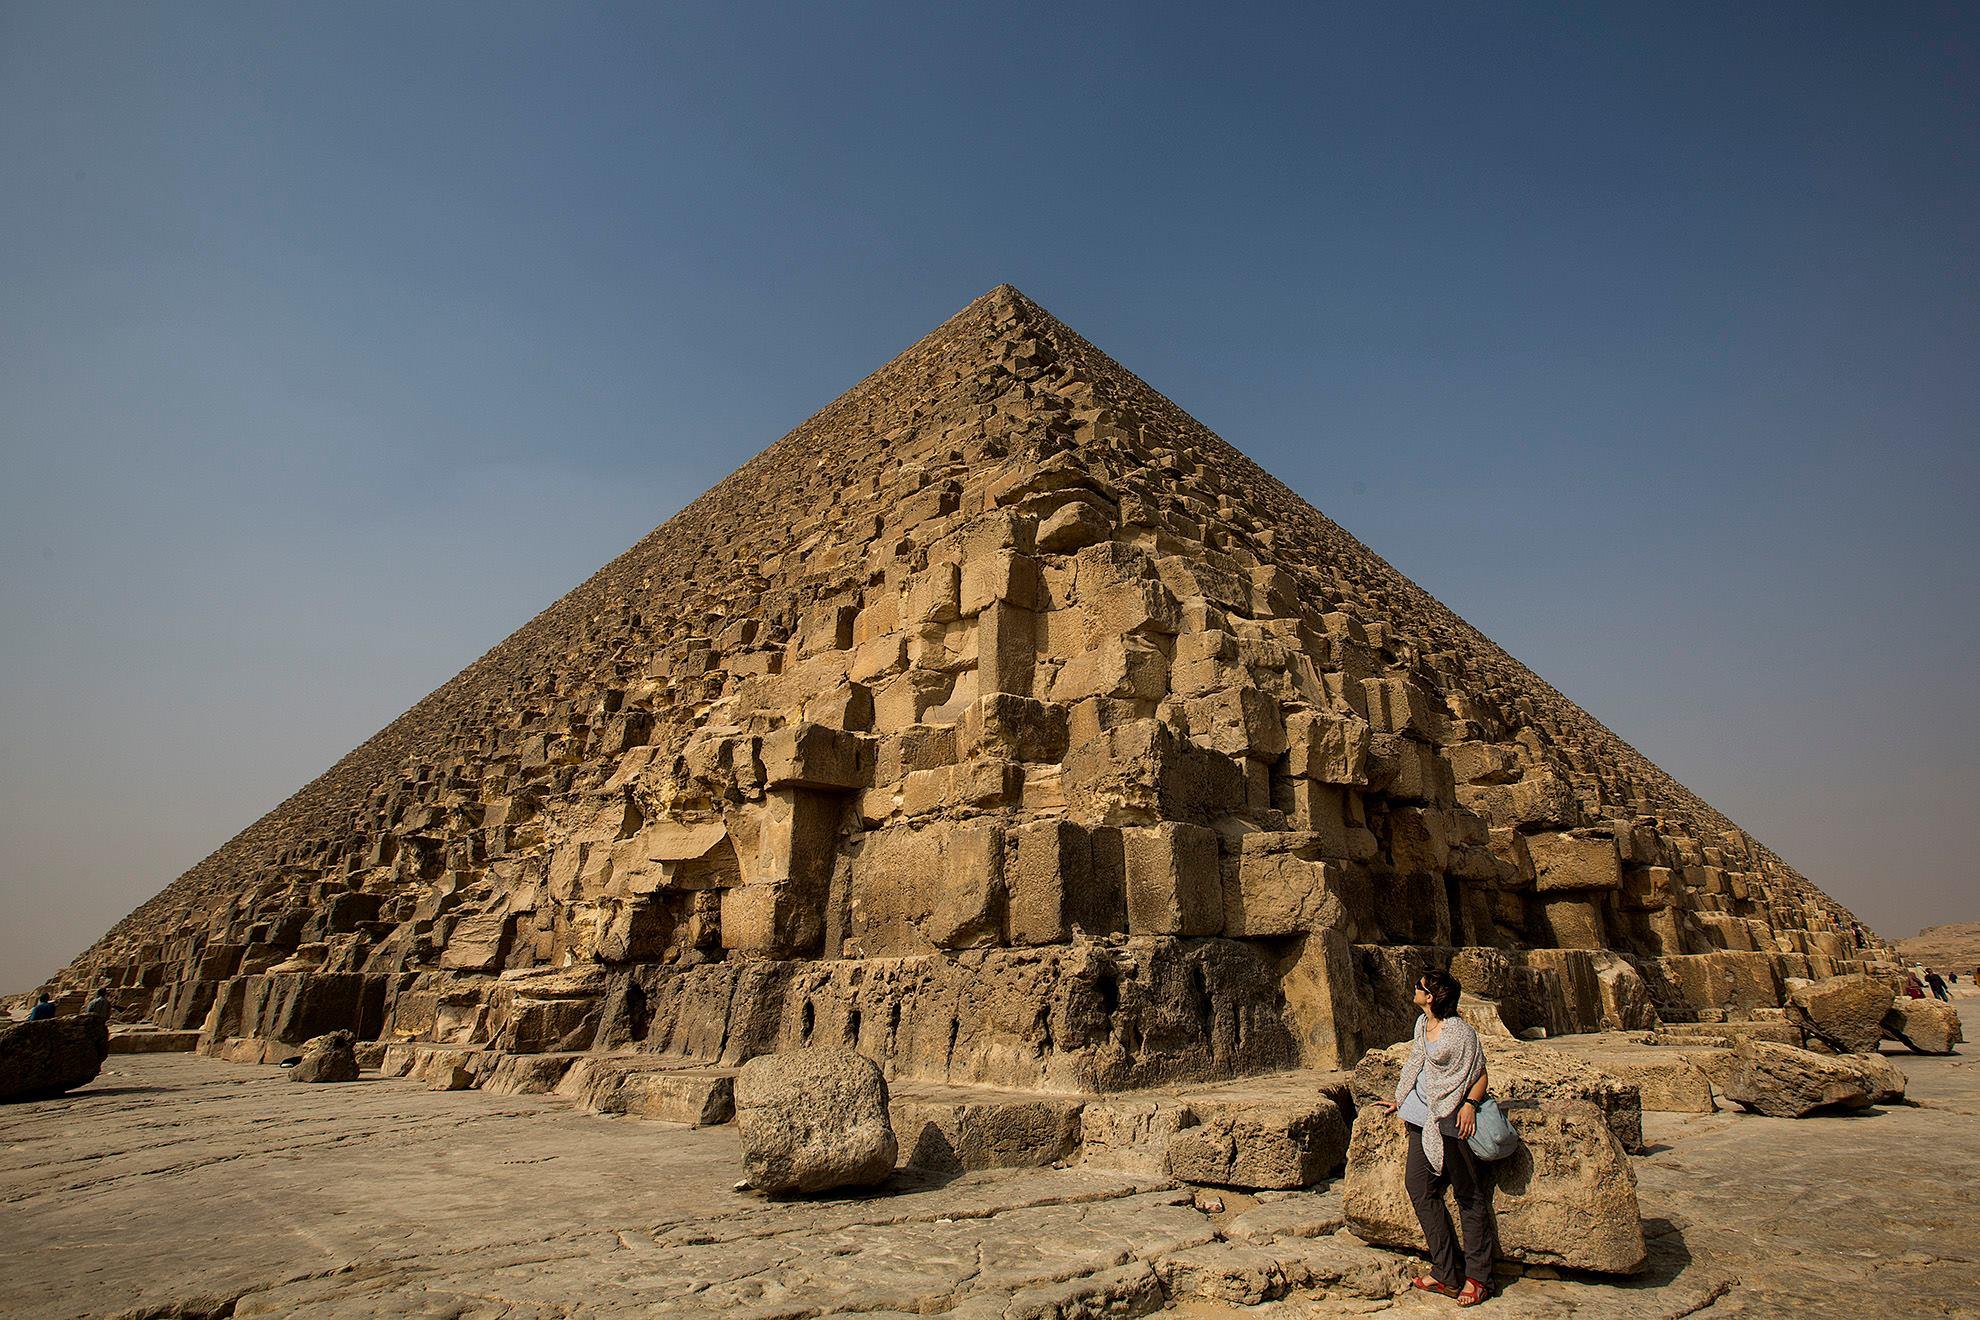 Keops's piràmide